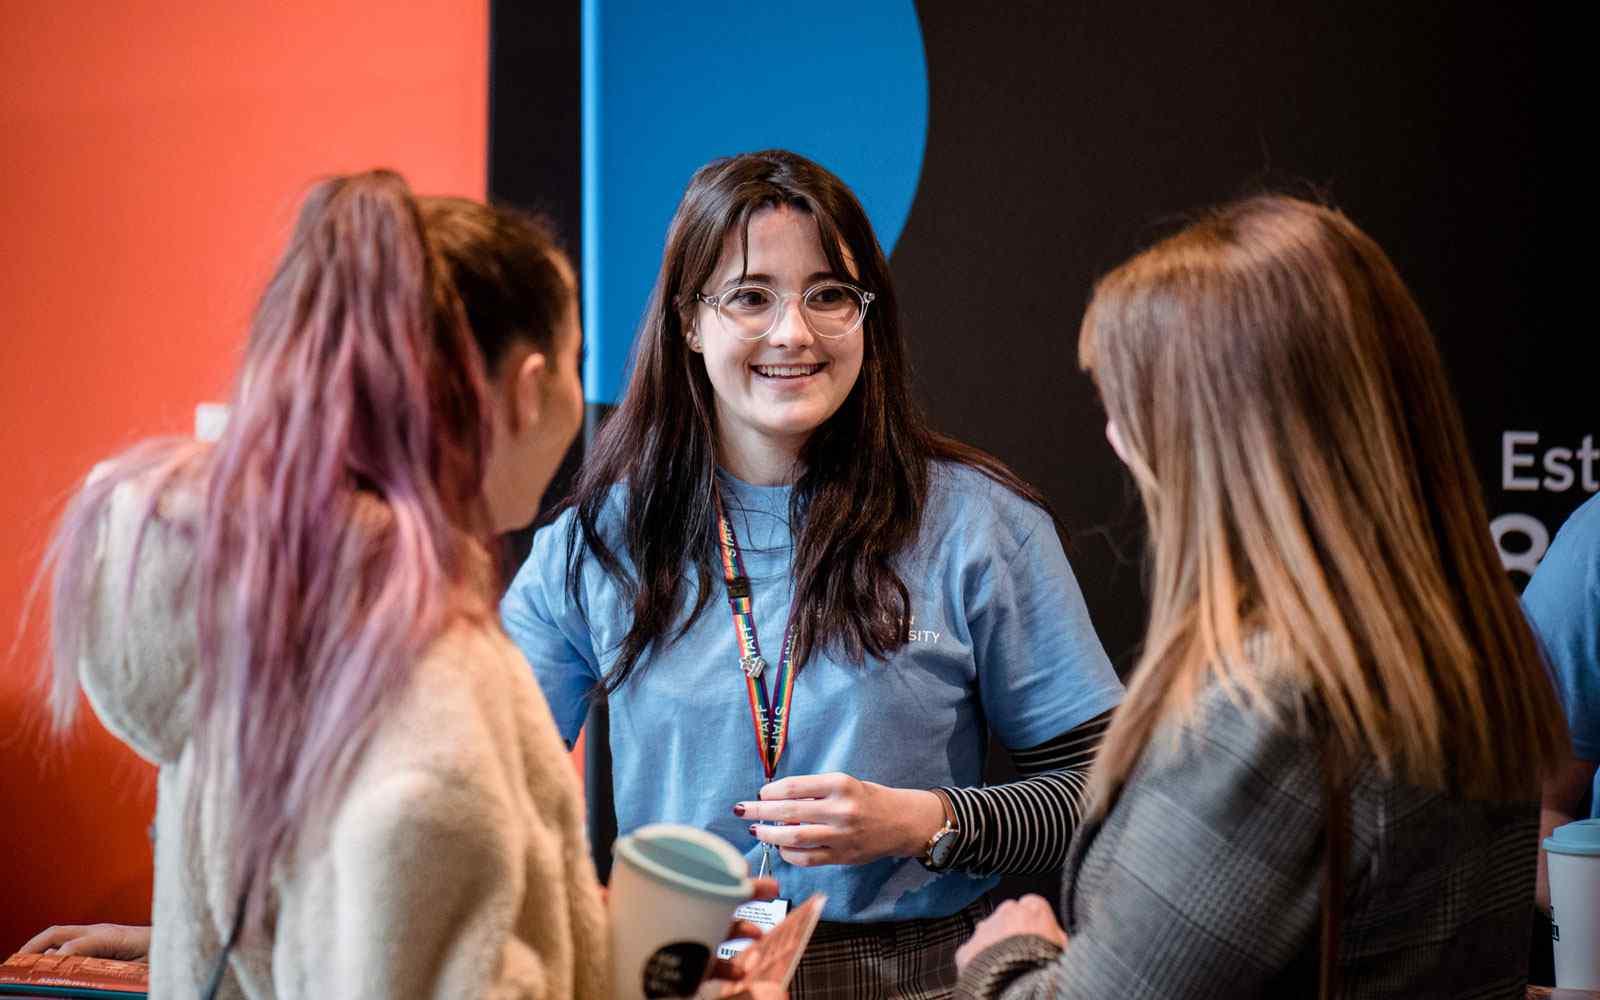 Student ambassador helping students